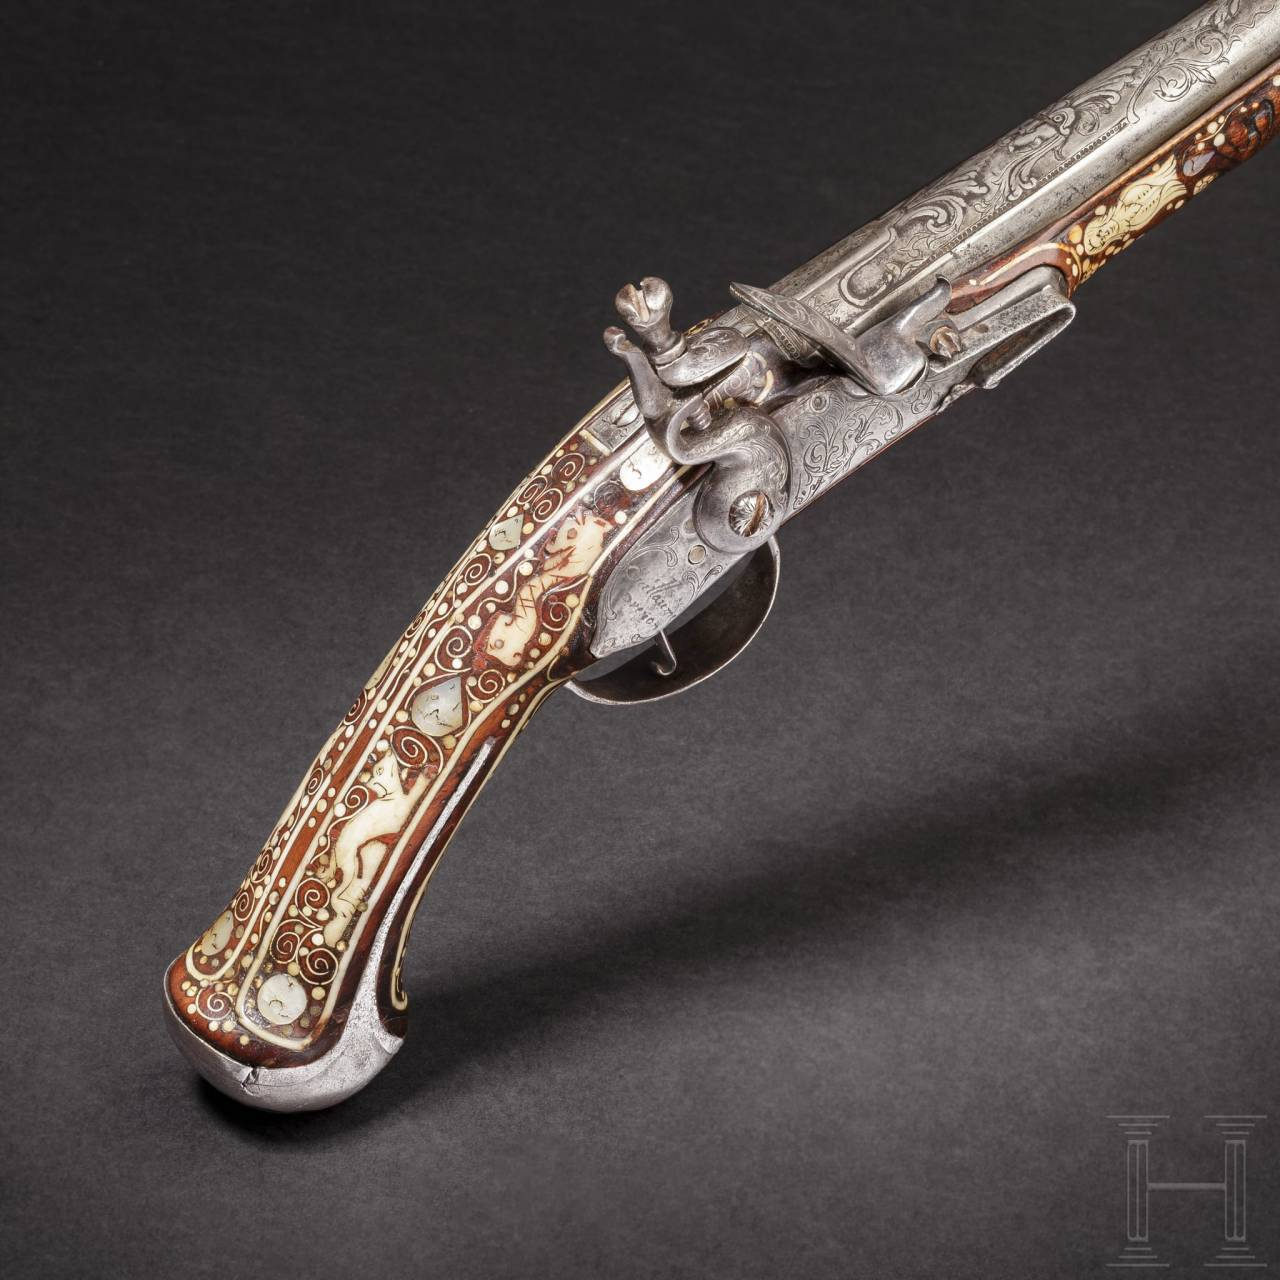 A Bohemian flintlock pistol with lavish bone inlays, circa 1690/1700